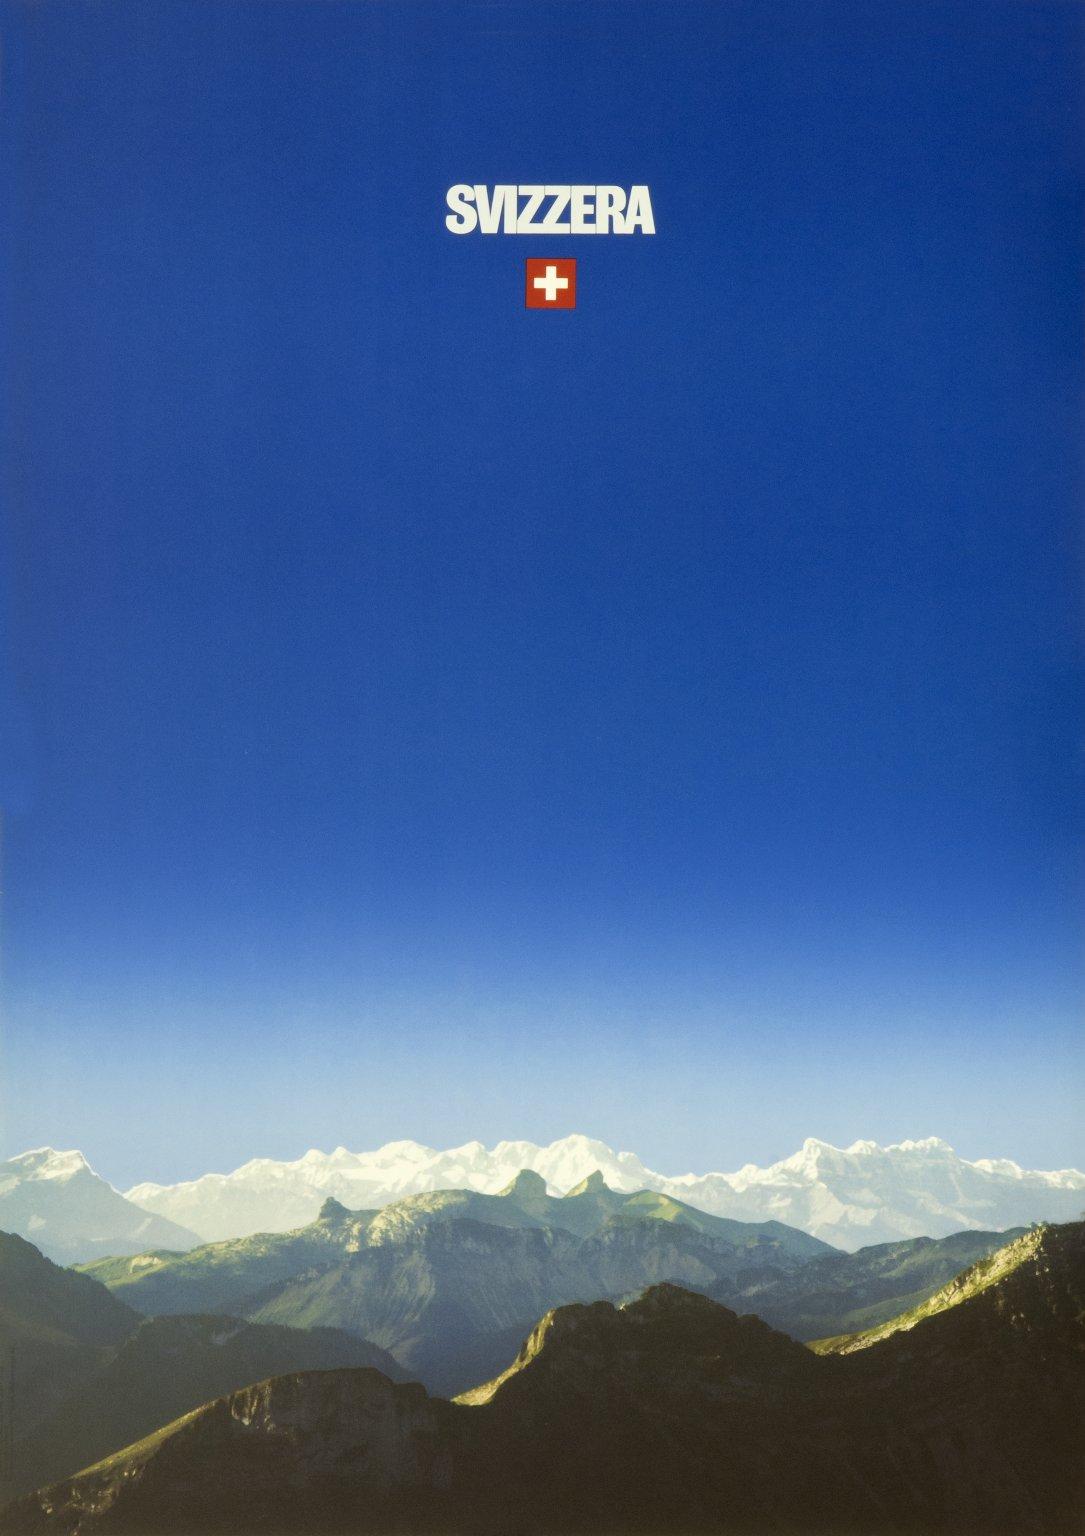 Alpenpanorama Schweiz/Suisse/Svizzera/Switzerland